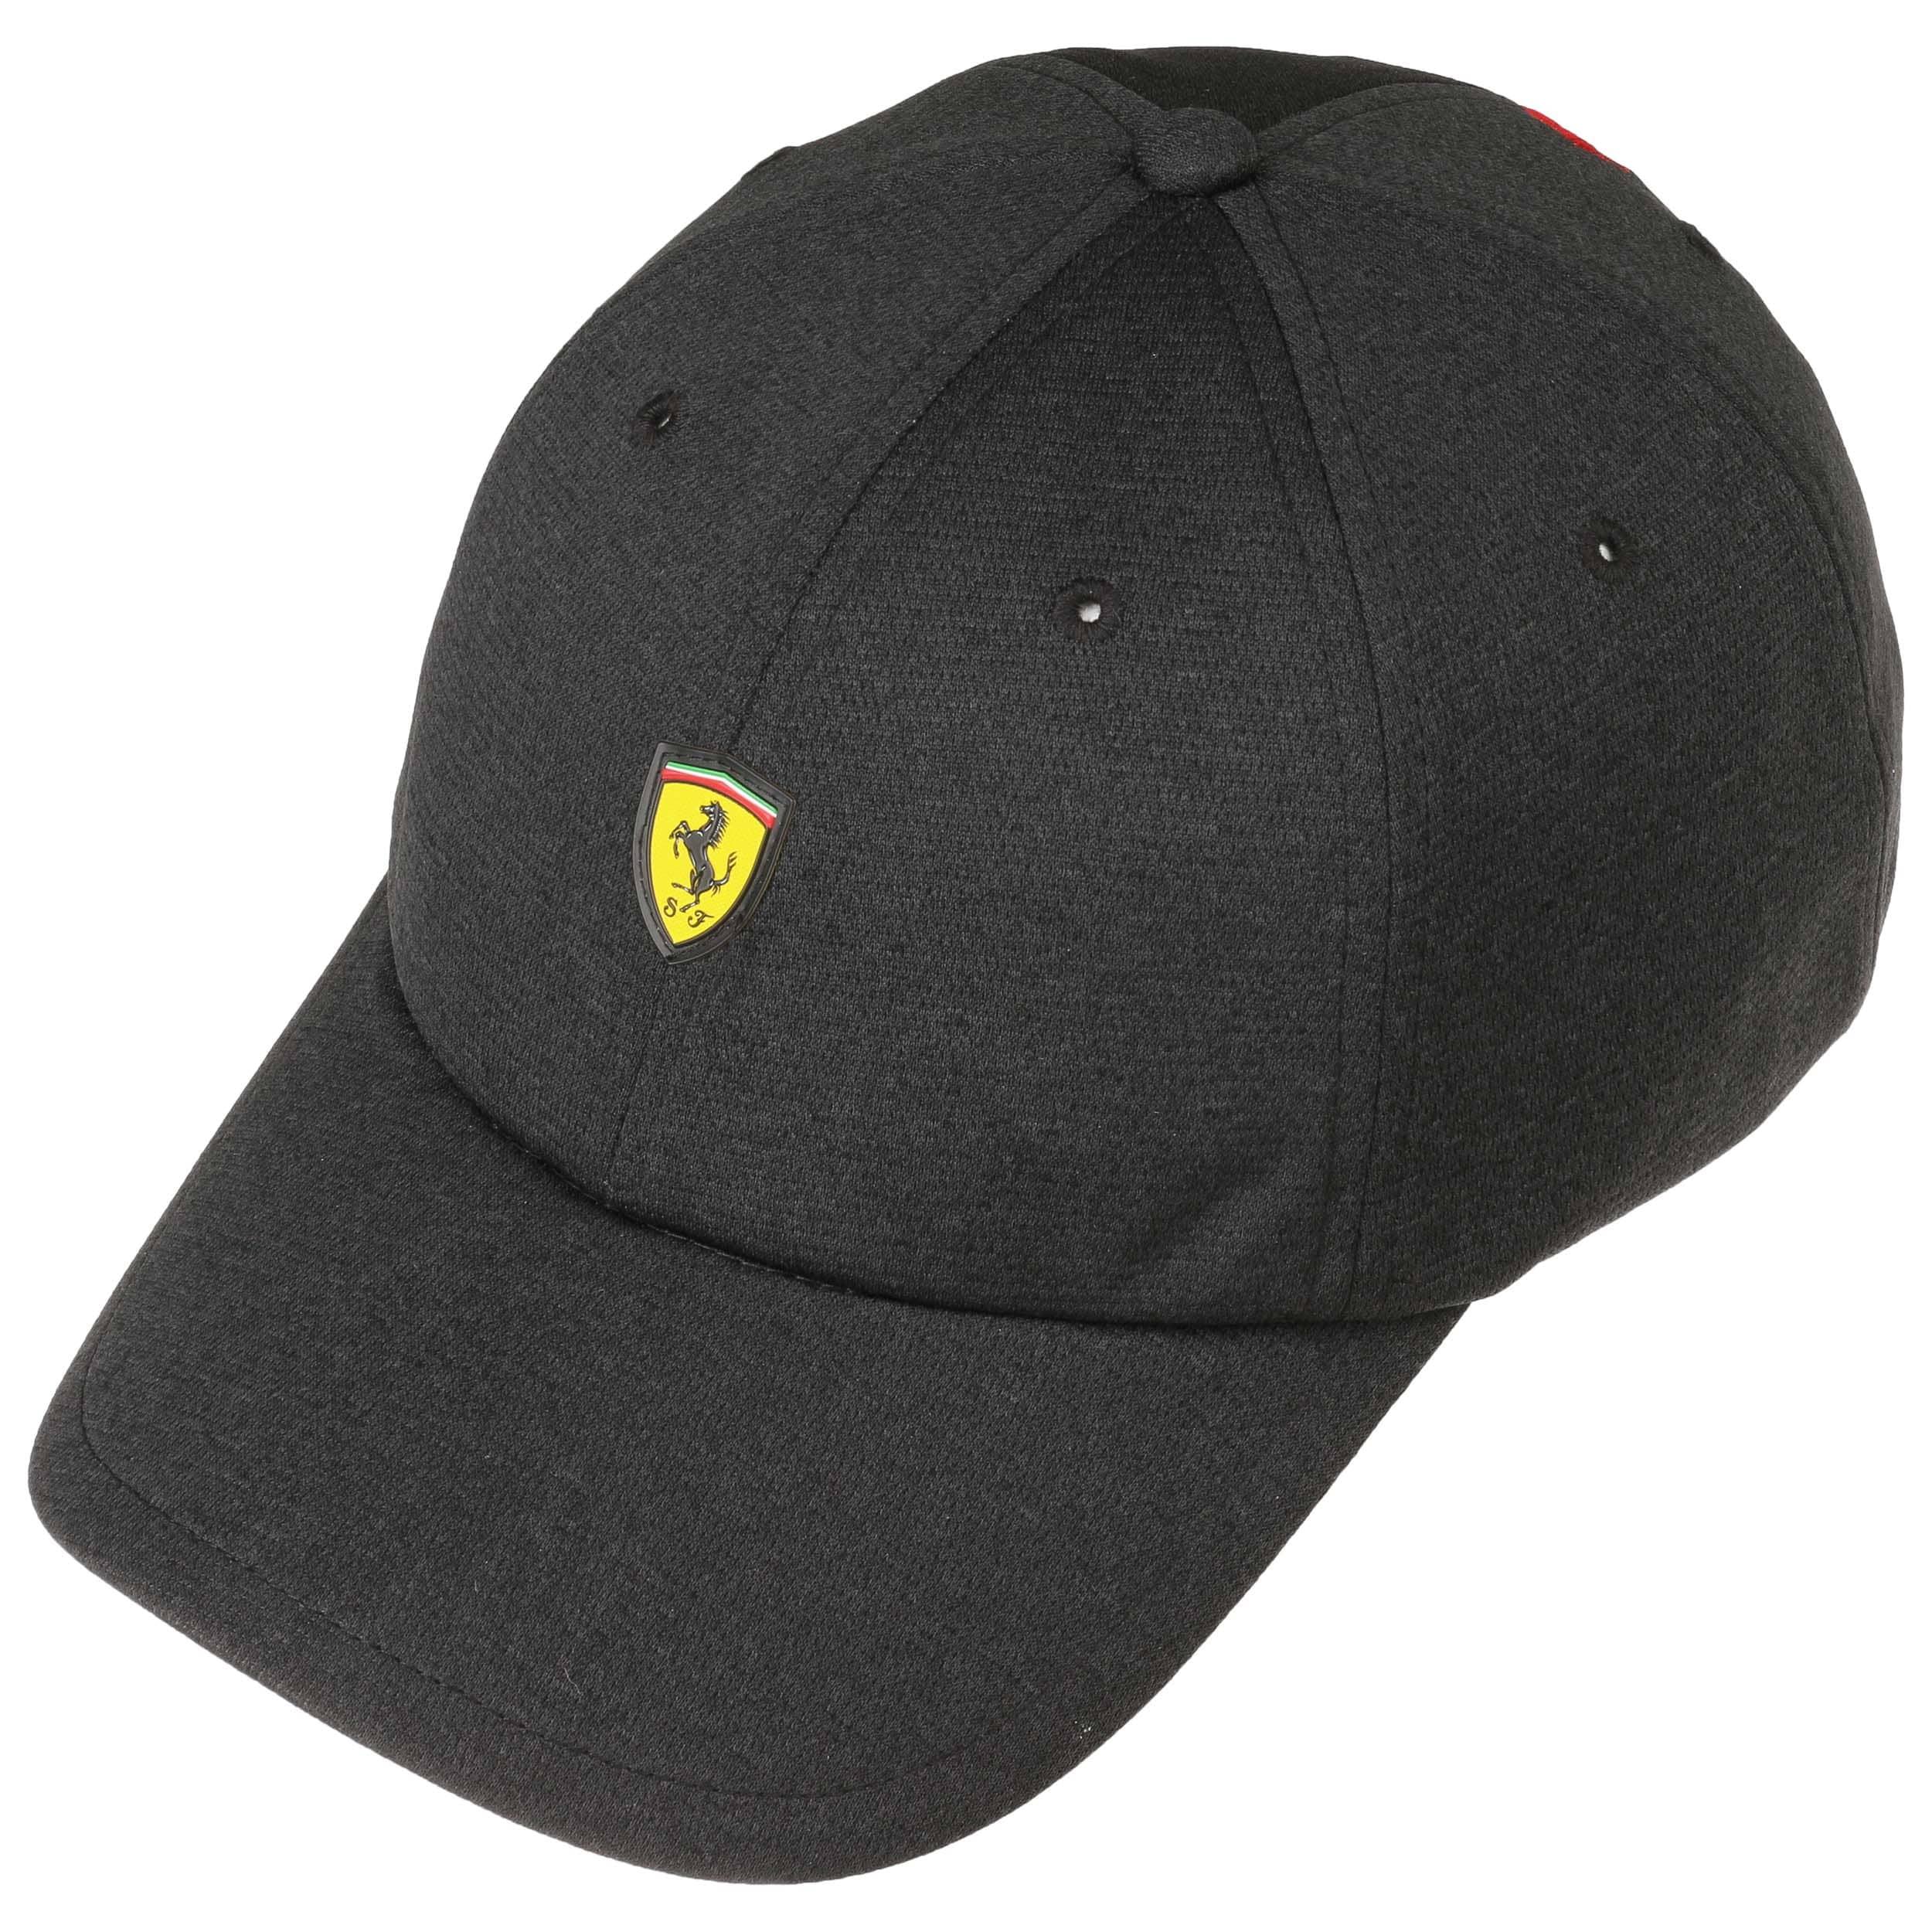 ... Cappellino Scuderia Ferrari Fanwear by PUMA - nero 1 ... 93b0b2ff07d0